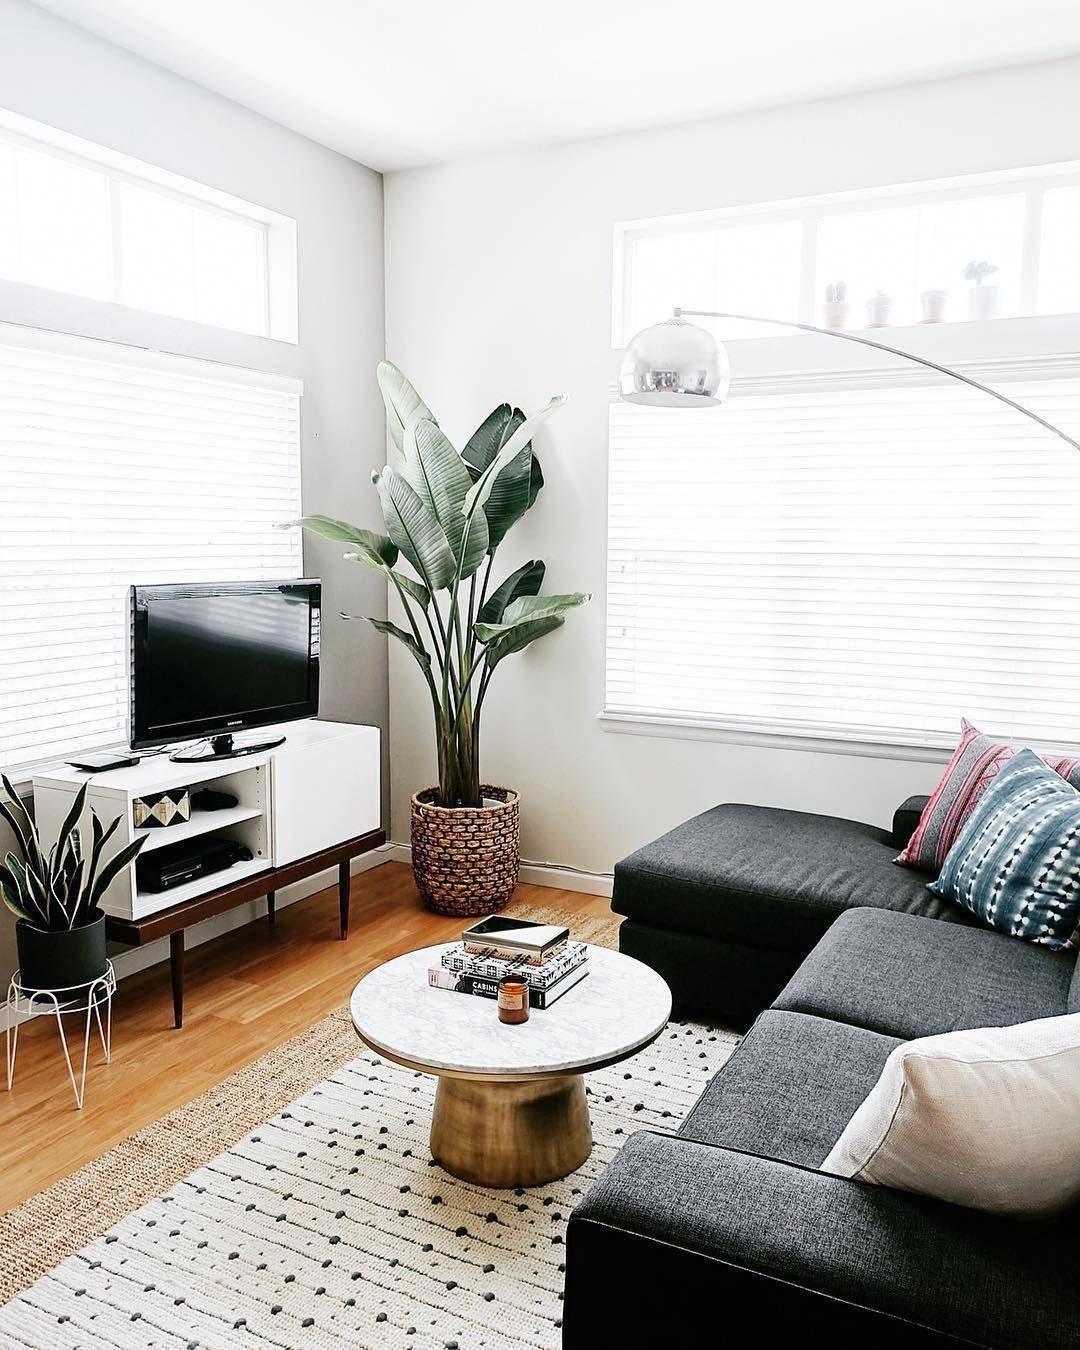 12 Furniture Stores Like Ikea To Buy Minimalist Home Decor Ikealivingroom Living Room Decor Apartment Small Living Room Design Small Living Room Decor